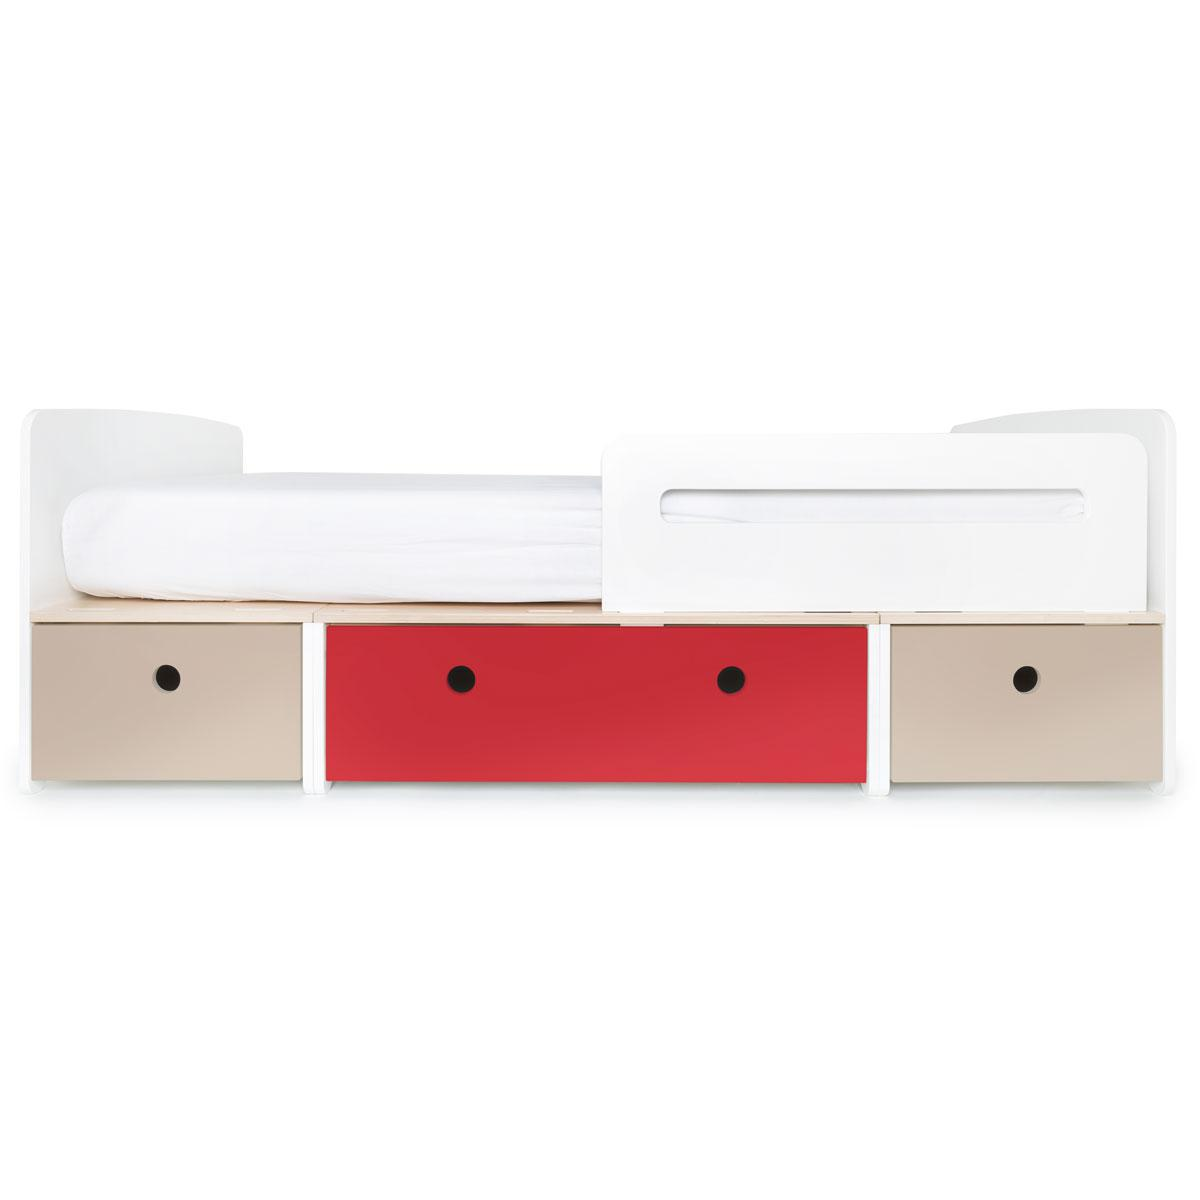 Kinderbett 90x200cm COLORFLEX warm grey-true red-warm grey